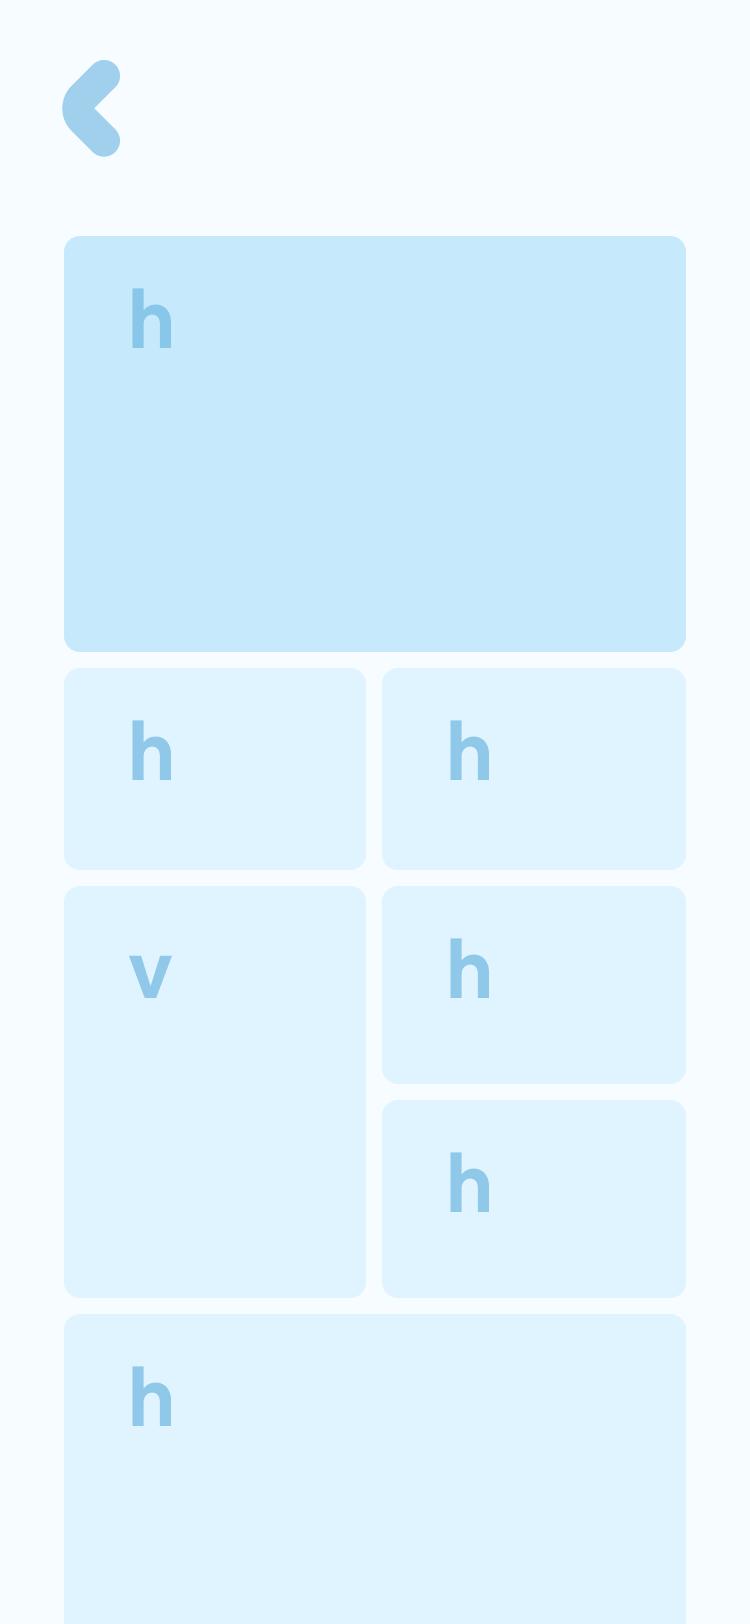 Scrolling grid